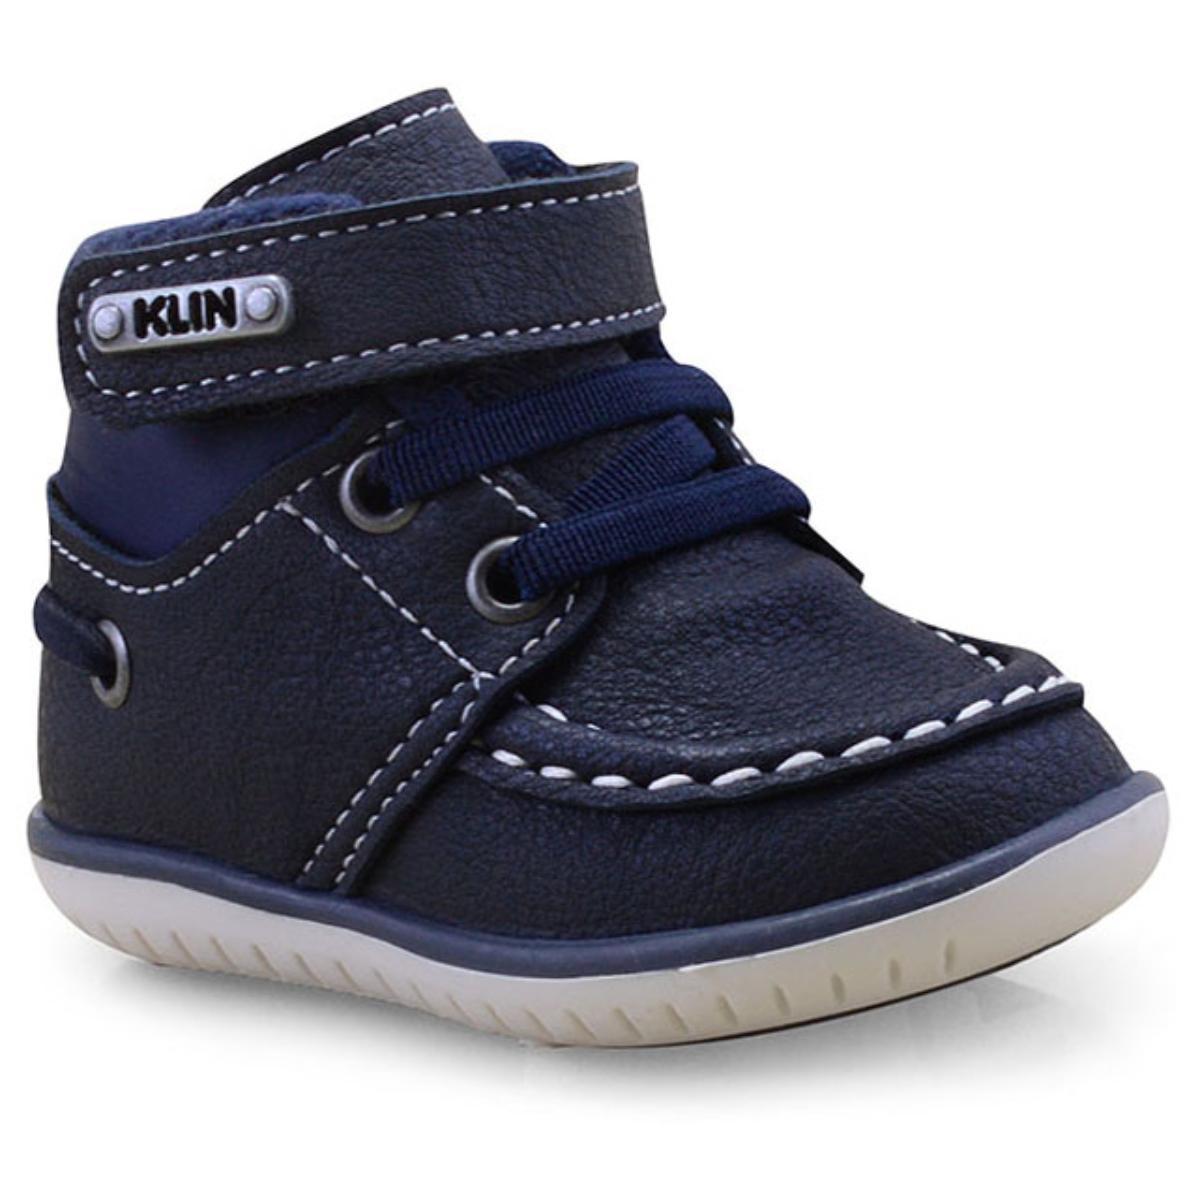 Sapato Masc Infantil Klin 166.106 Marinho